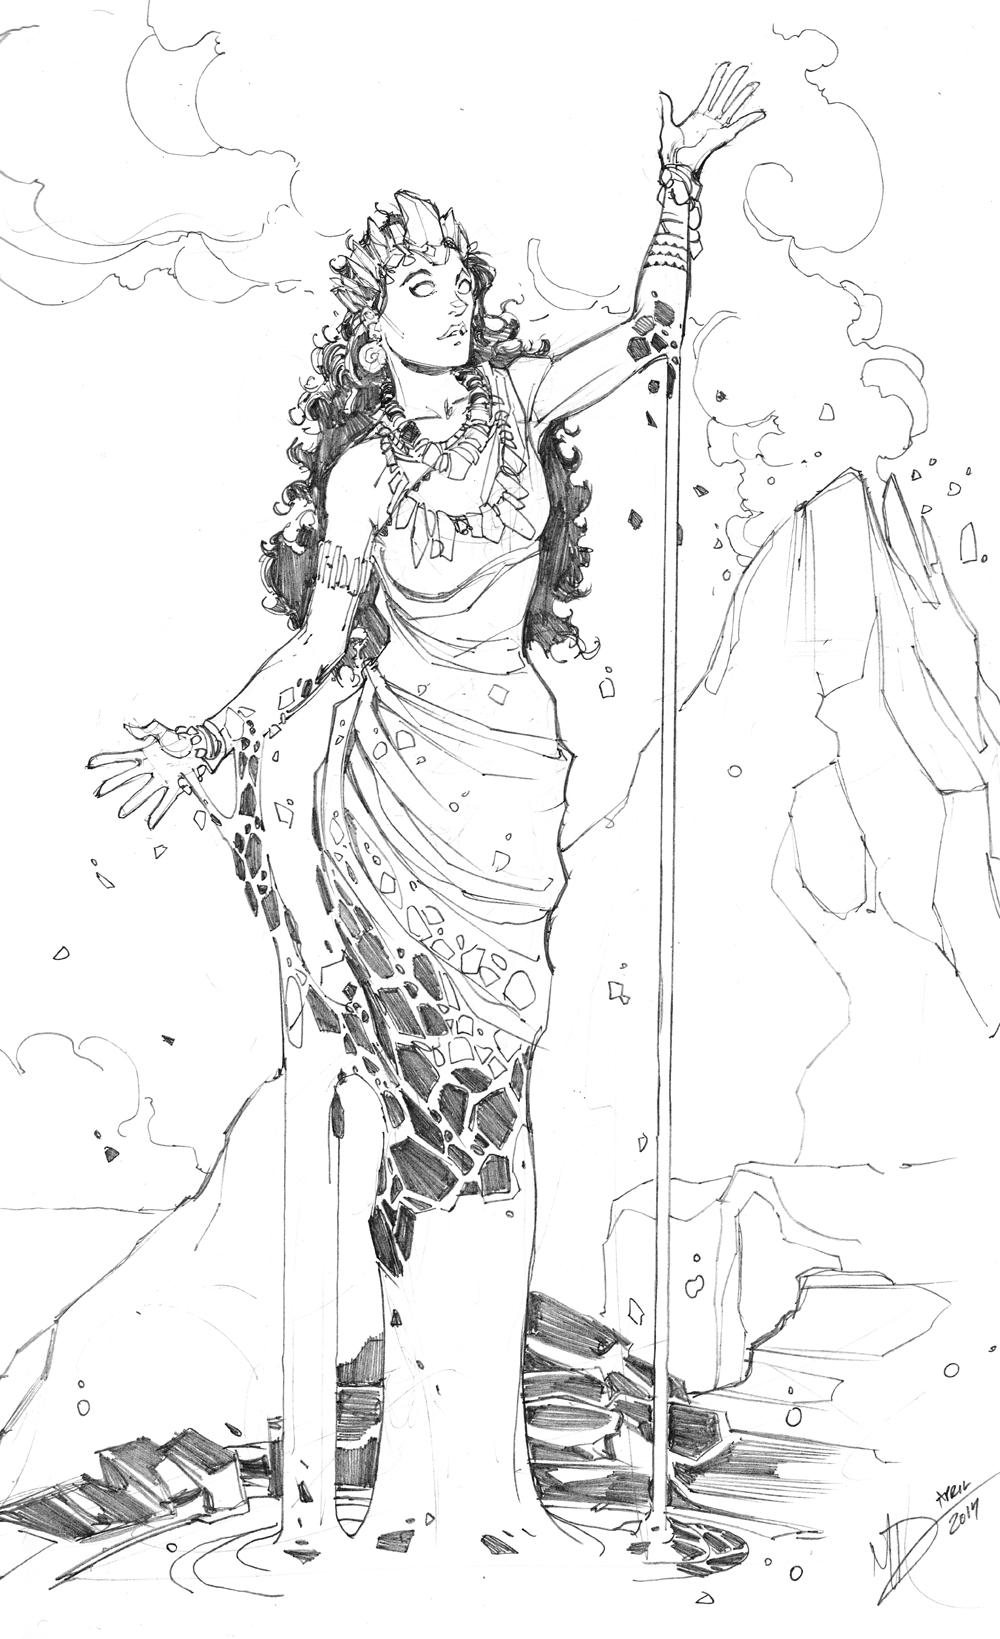 Line Drawing Volcano : Hawaiian goddess of volcanoes by max dunbar on deviantart